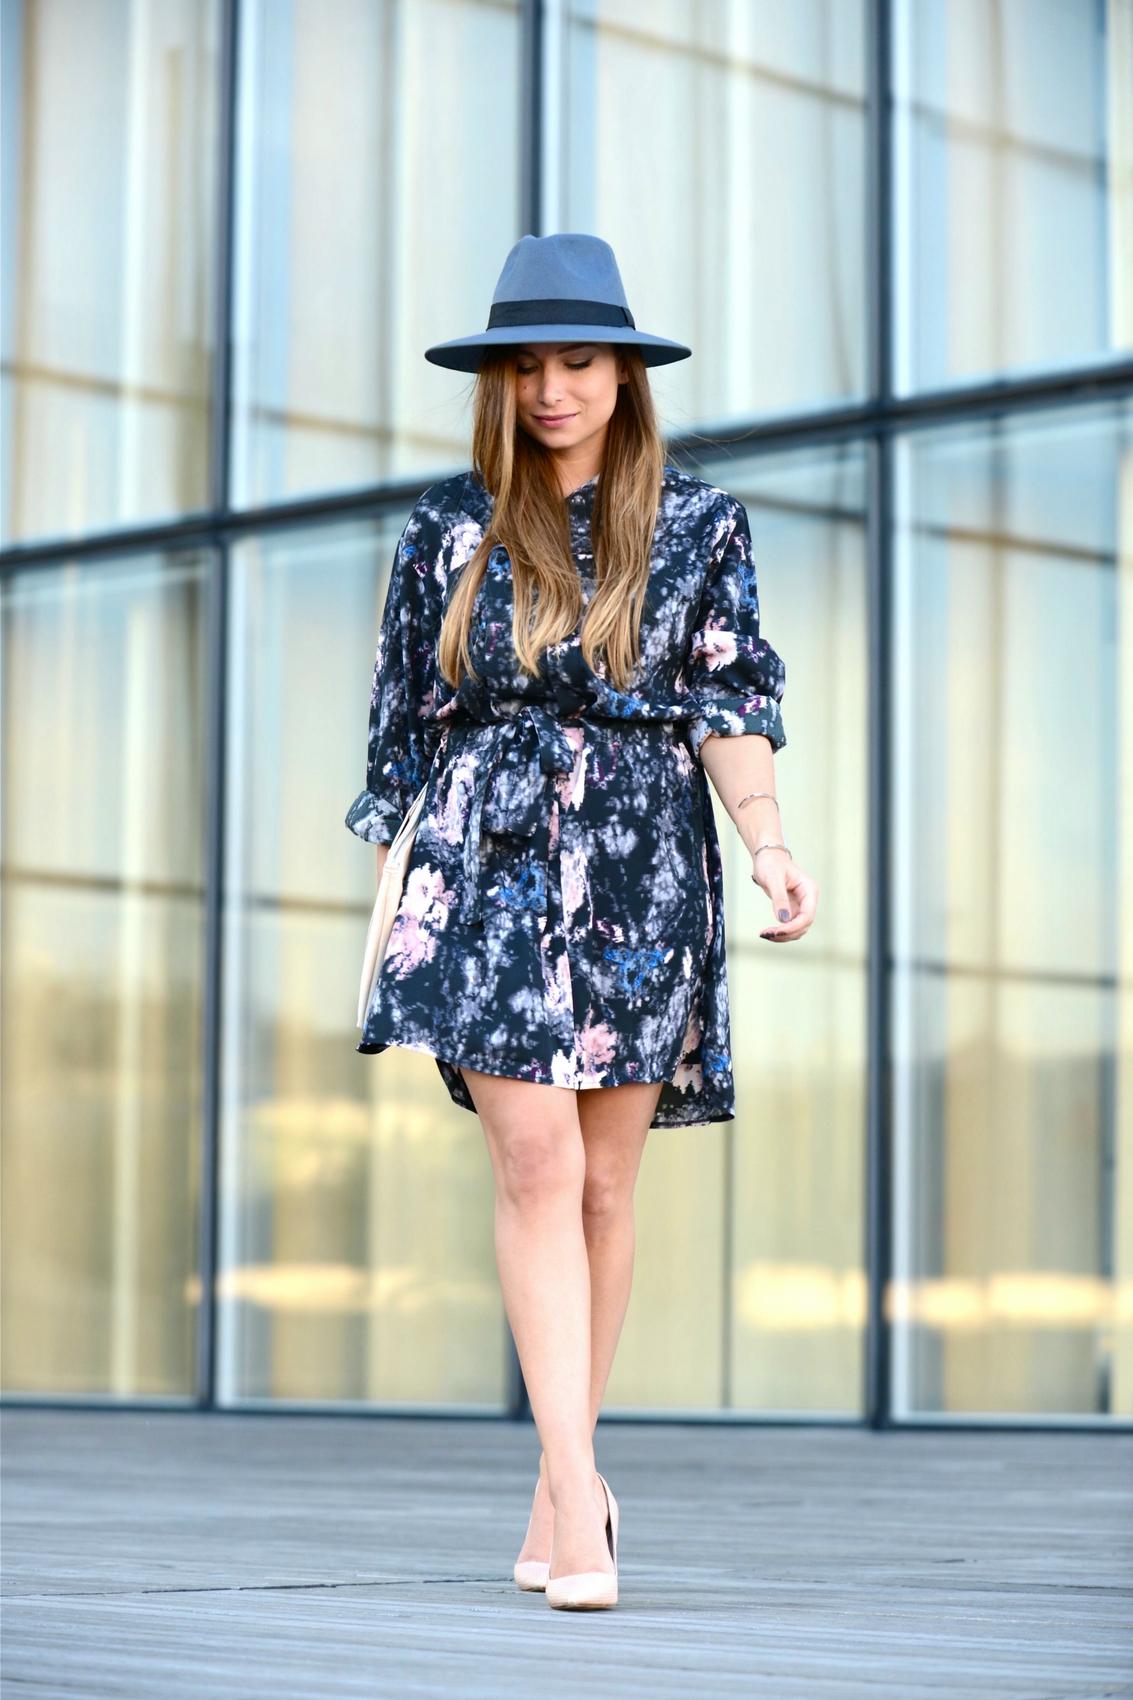 fedora hat boohoo arty dress millmanst nude high heels stiletto zara